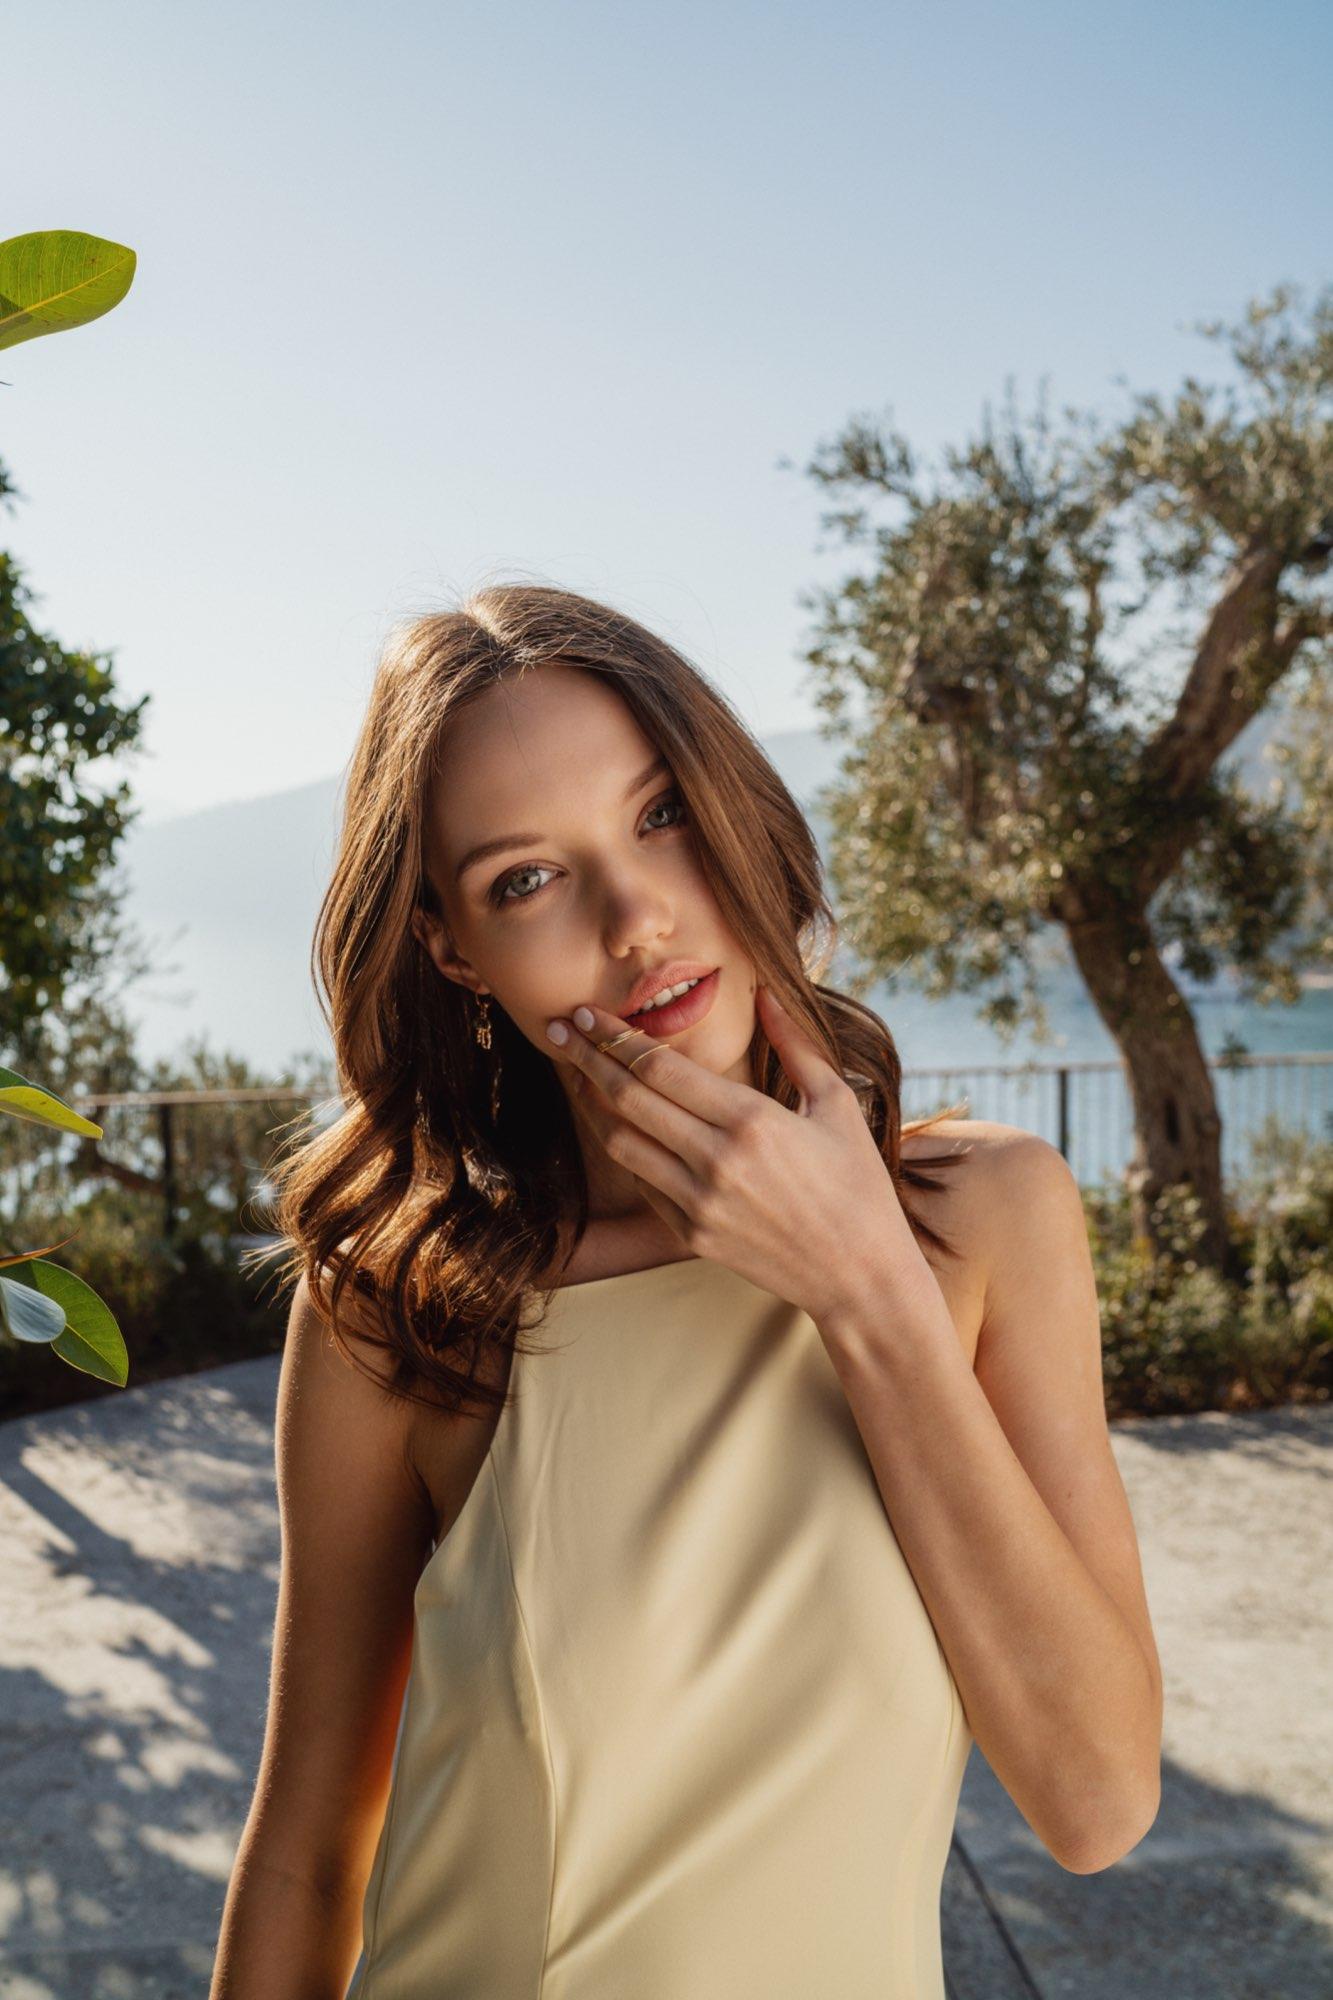 Hair, Nail, Make-up und Fashion styling portfolio / julia-jauner - h-m-dosenbach-ID730-1.jpeg?v=1627307128